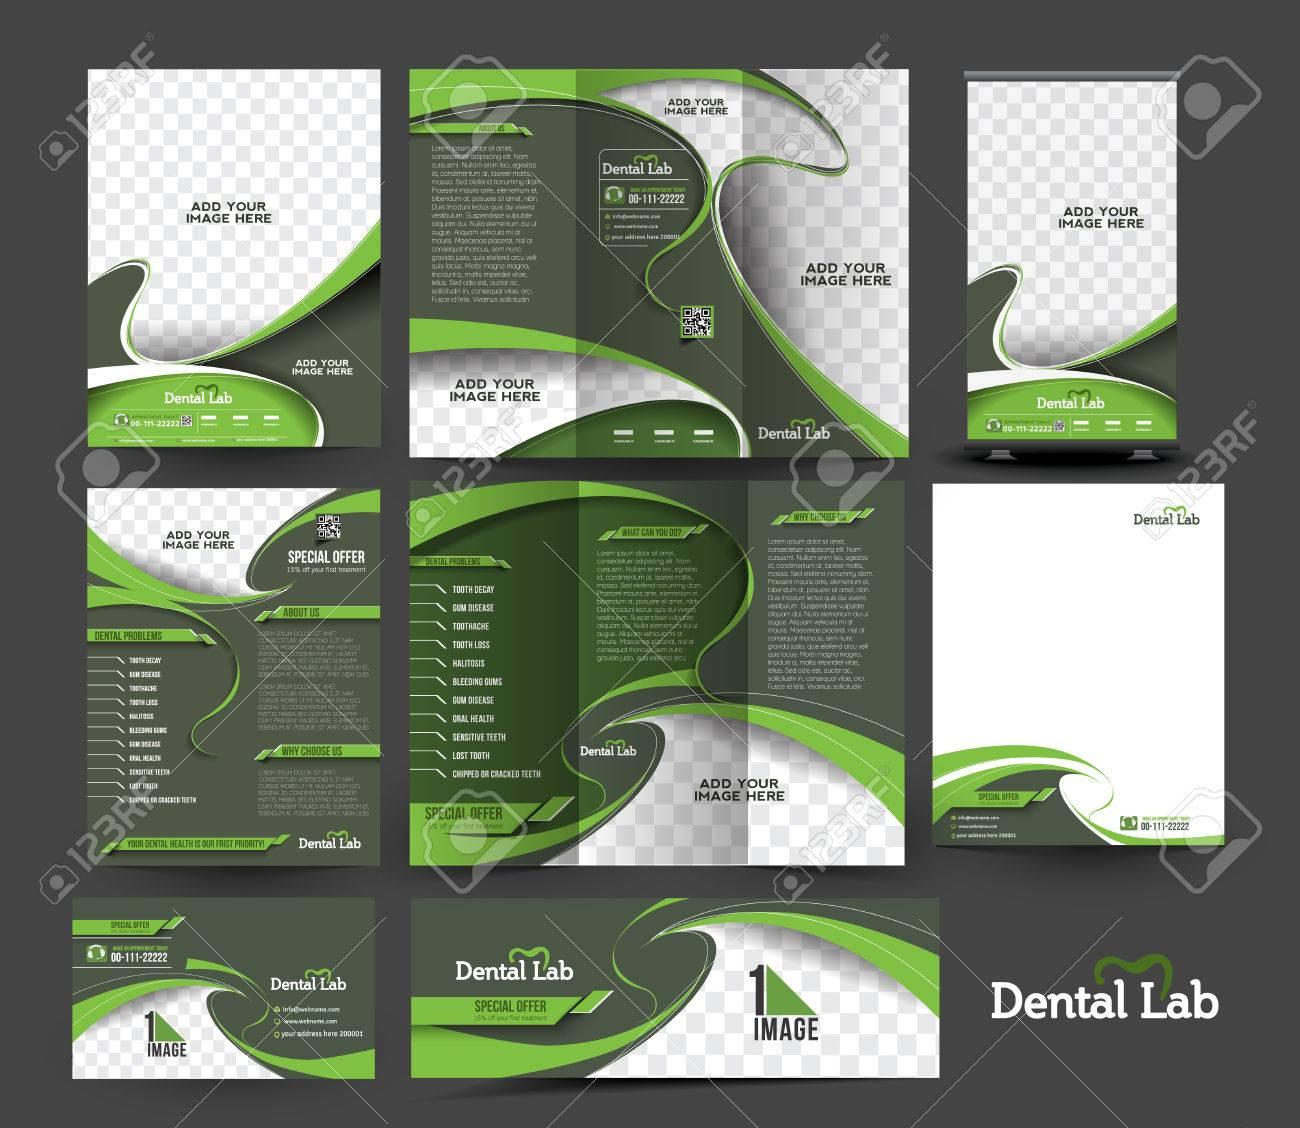 Dental Hospital Business Stationery Set Template. - 41834304